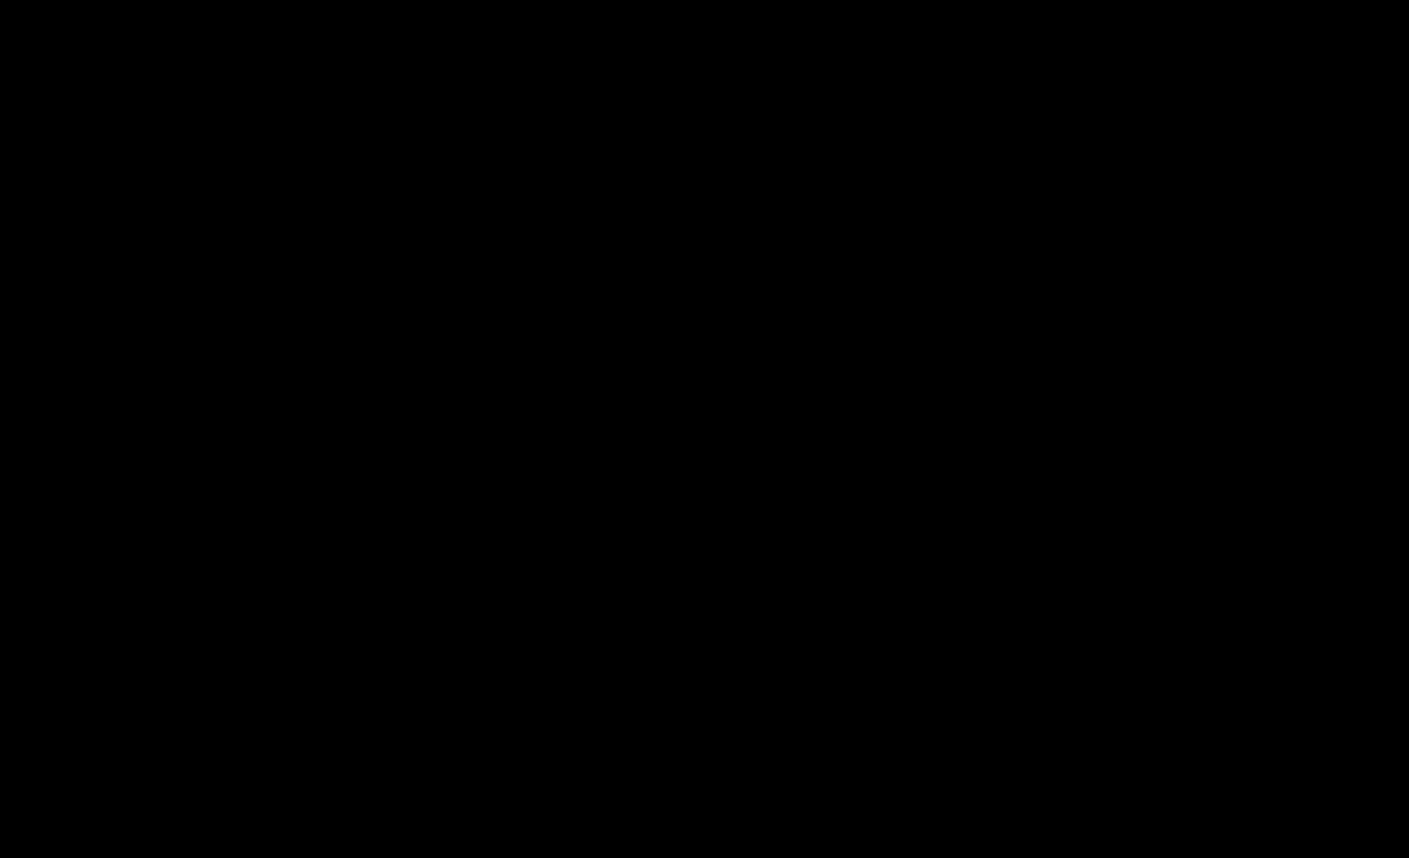 ace_logo|a|bk.png